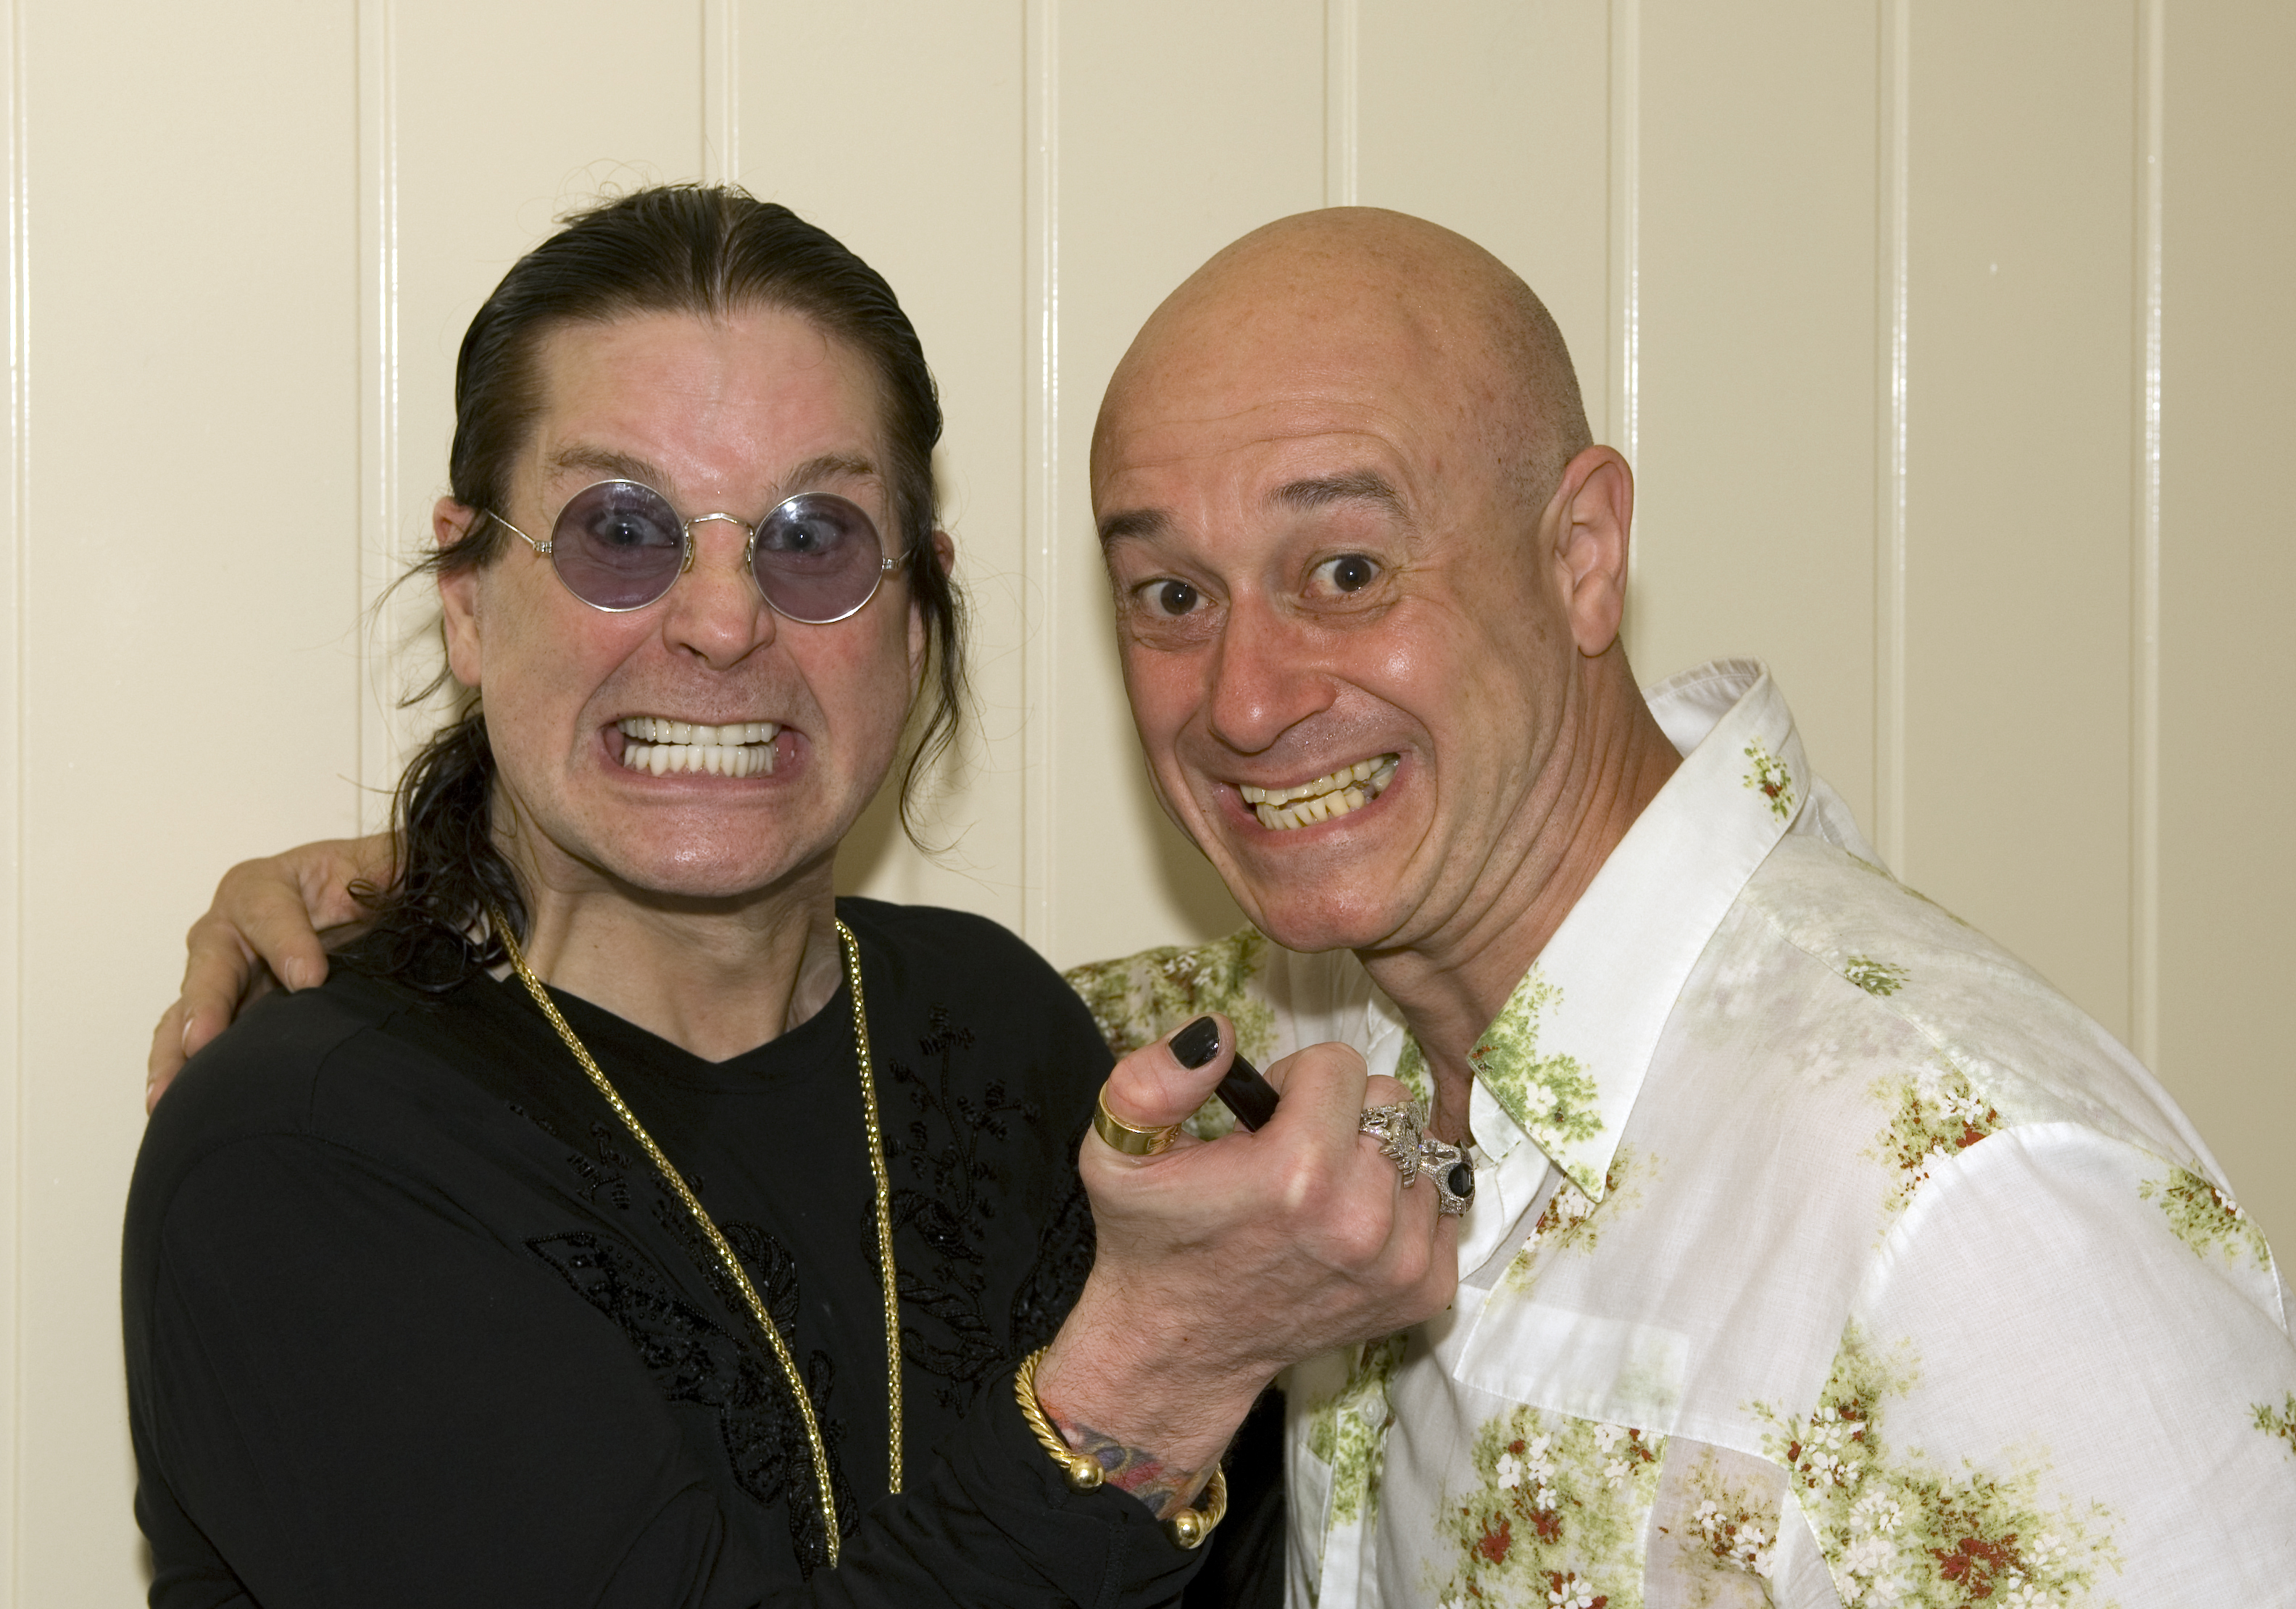 PIC0410 - В преддверии долгожданного концерта Black Sabbath